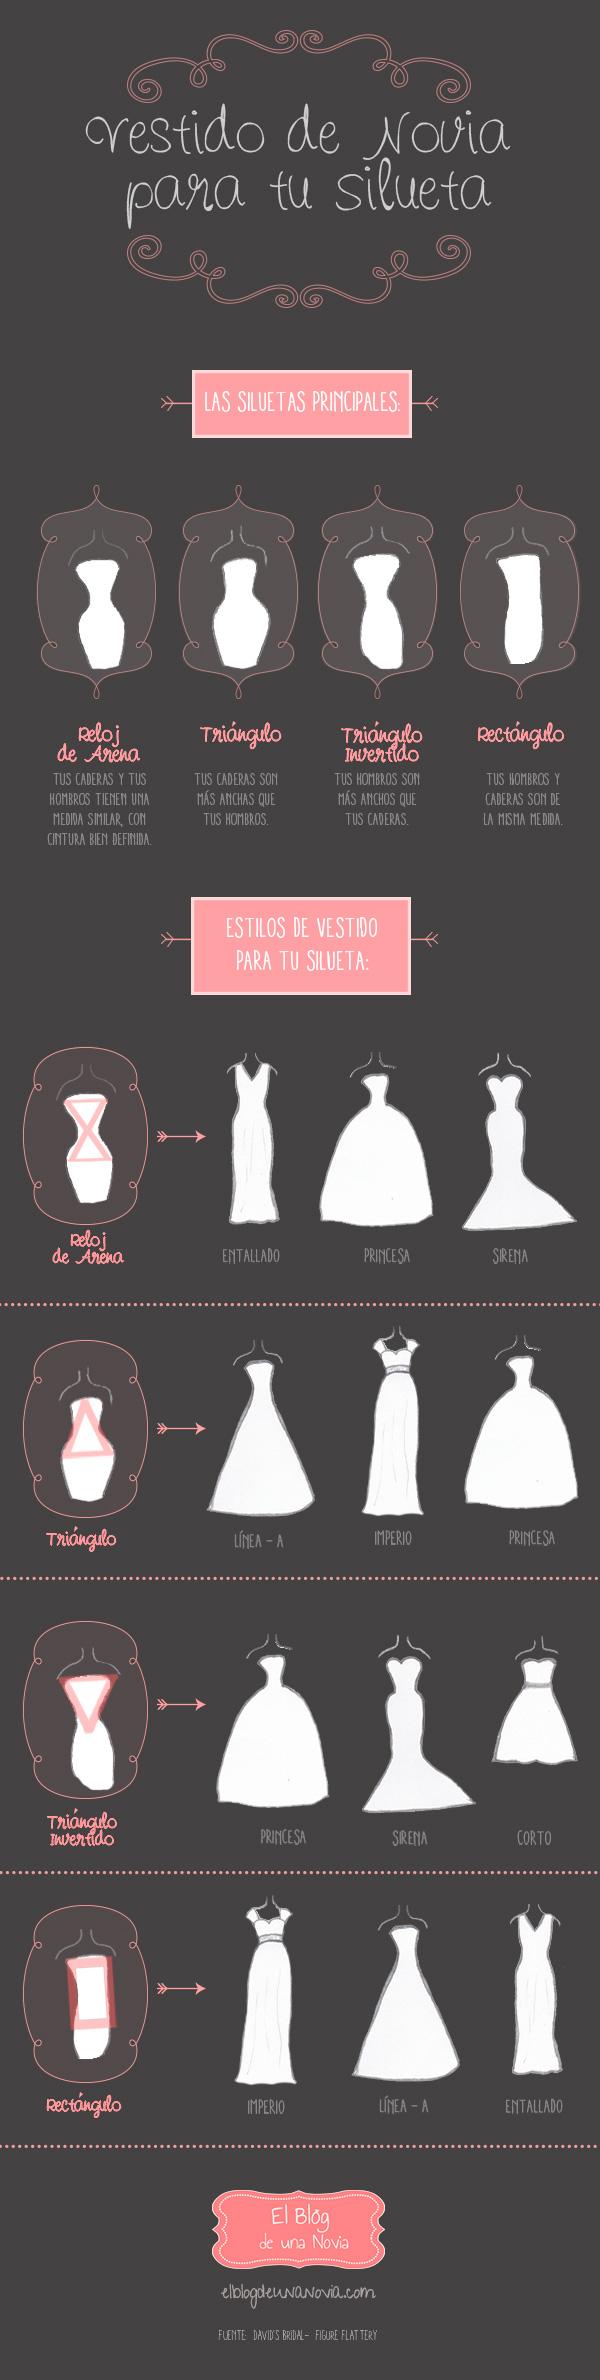 Vestido de Novia para tu Silueta - Escoge un vestido de novia que resalte tu figura